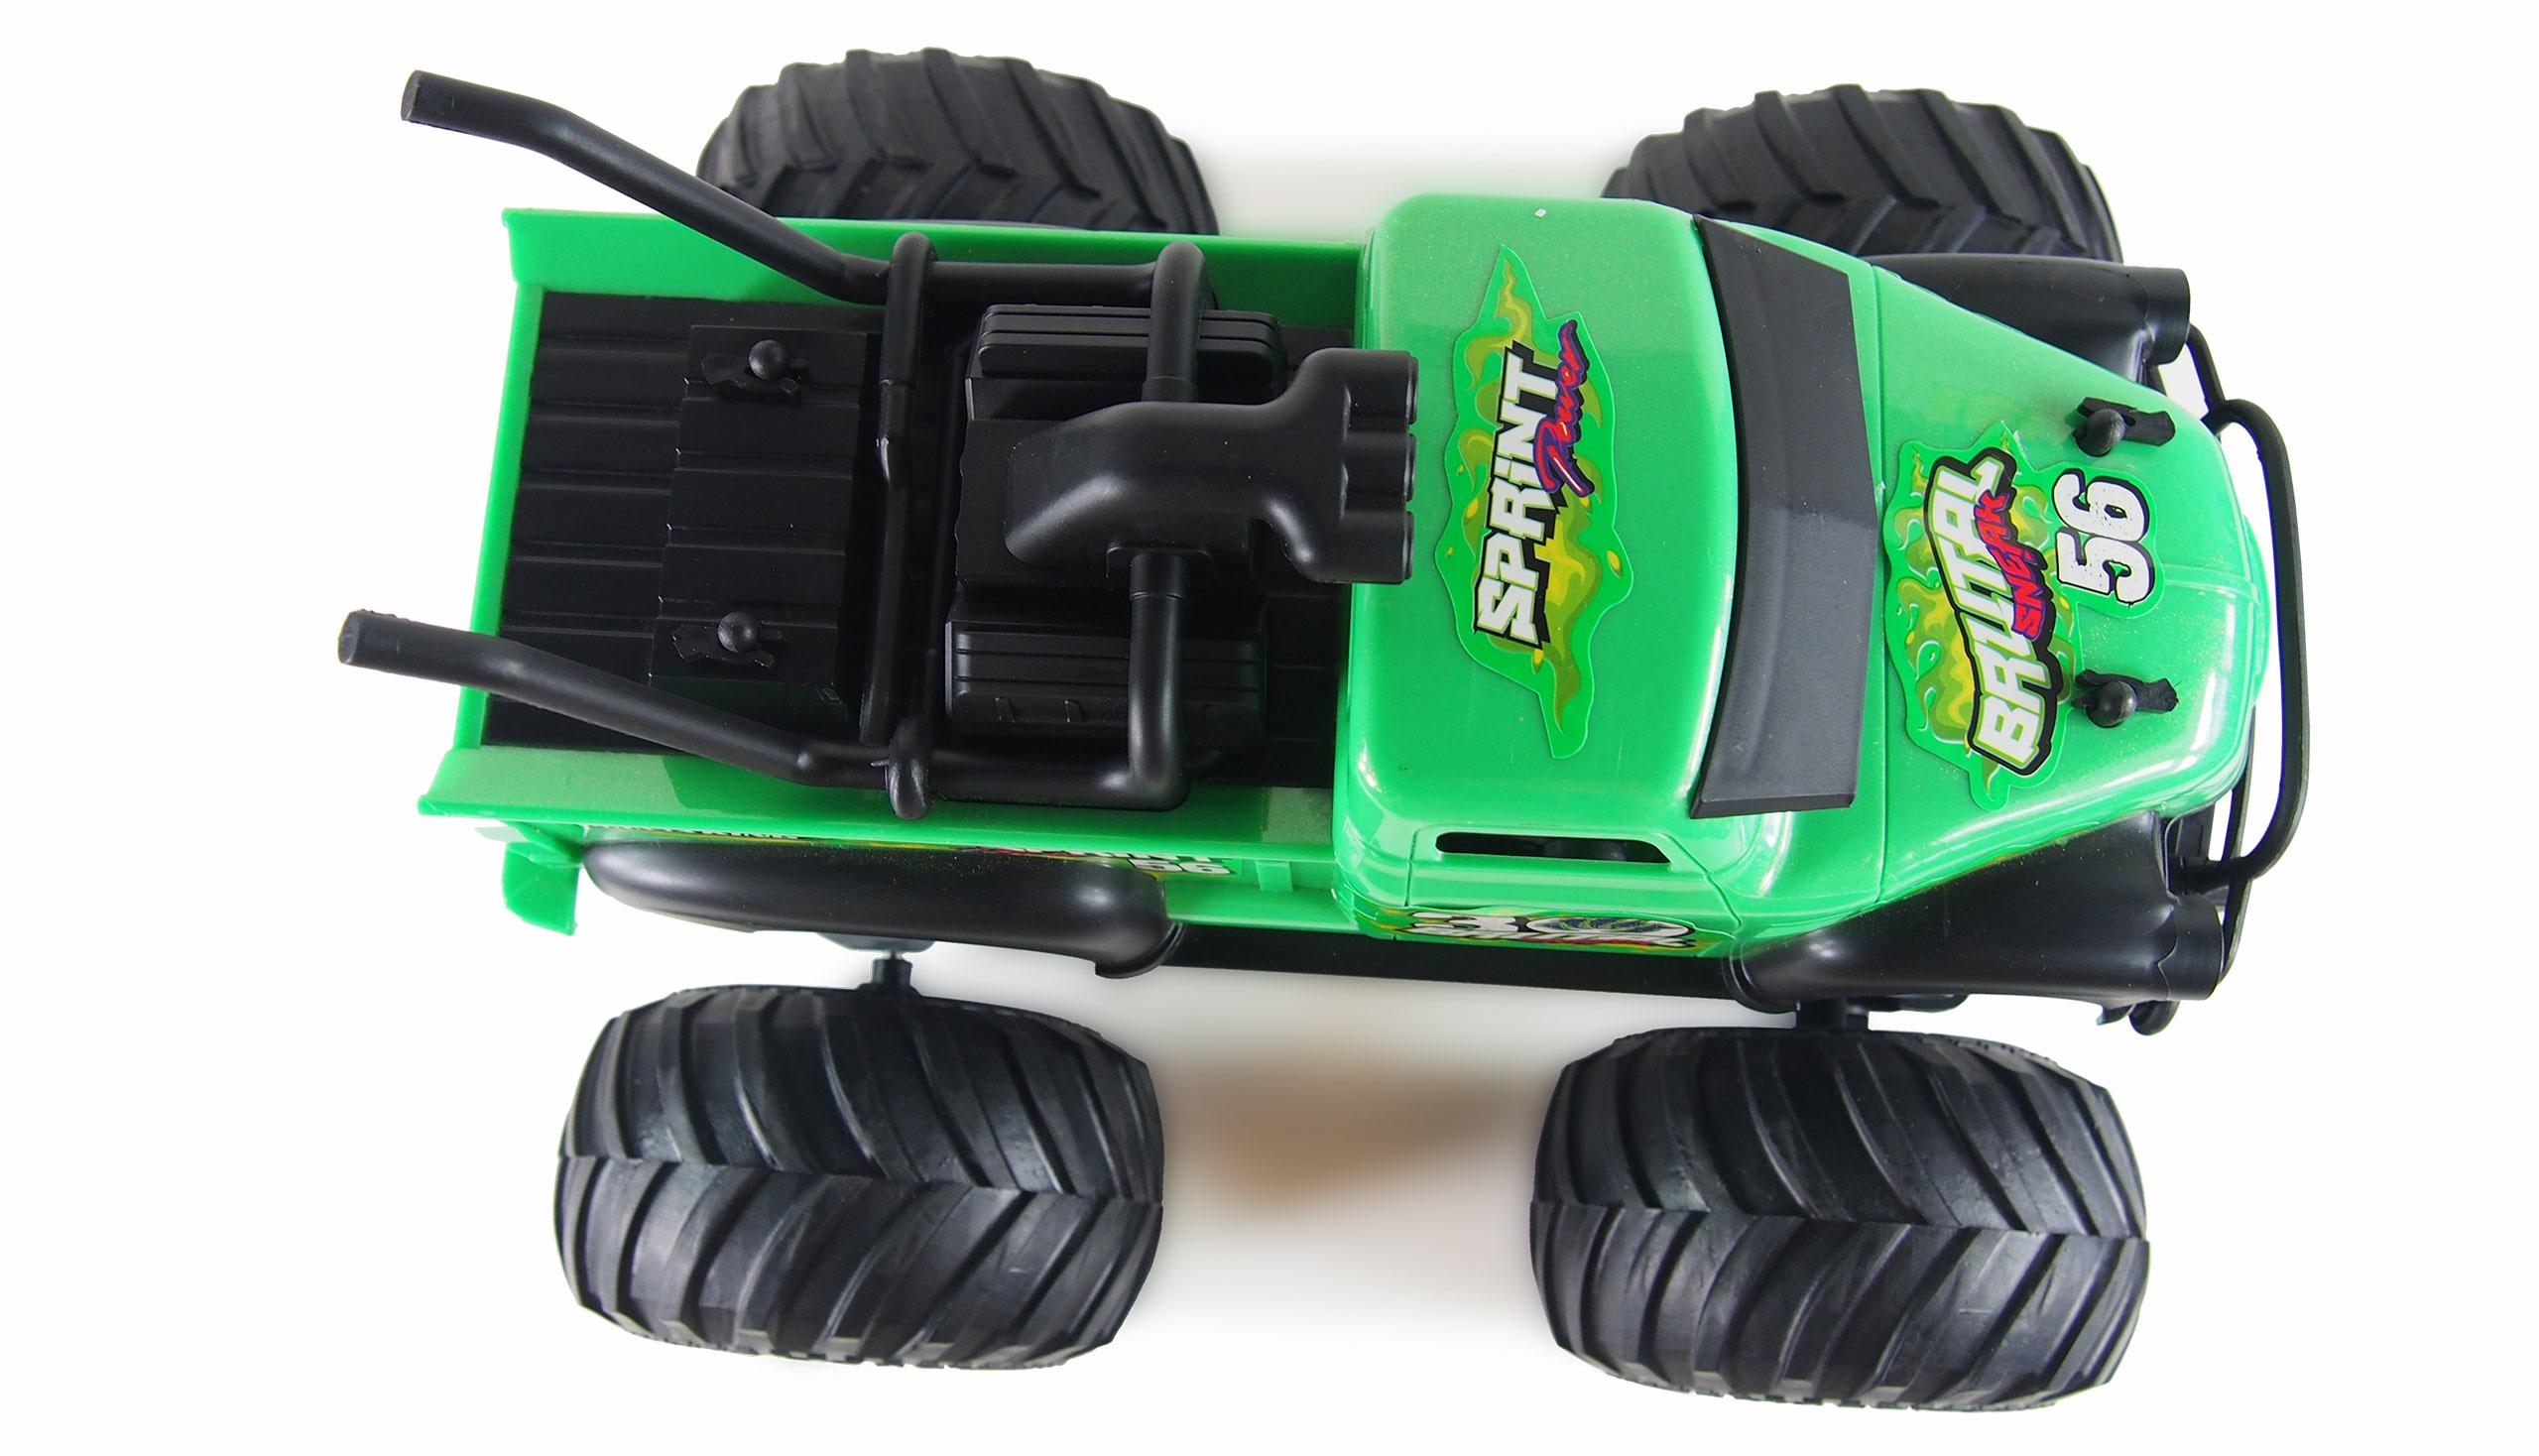 Amewi Crazy - Monstertruck - 1:16 - Junge - 6 Jahr(e) - 700 mAh - 1 kg